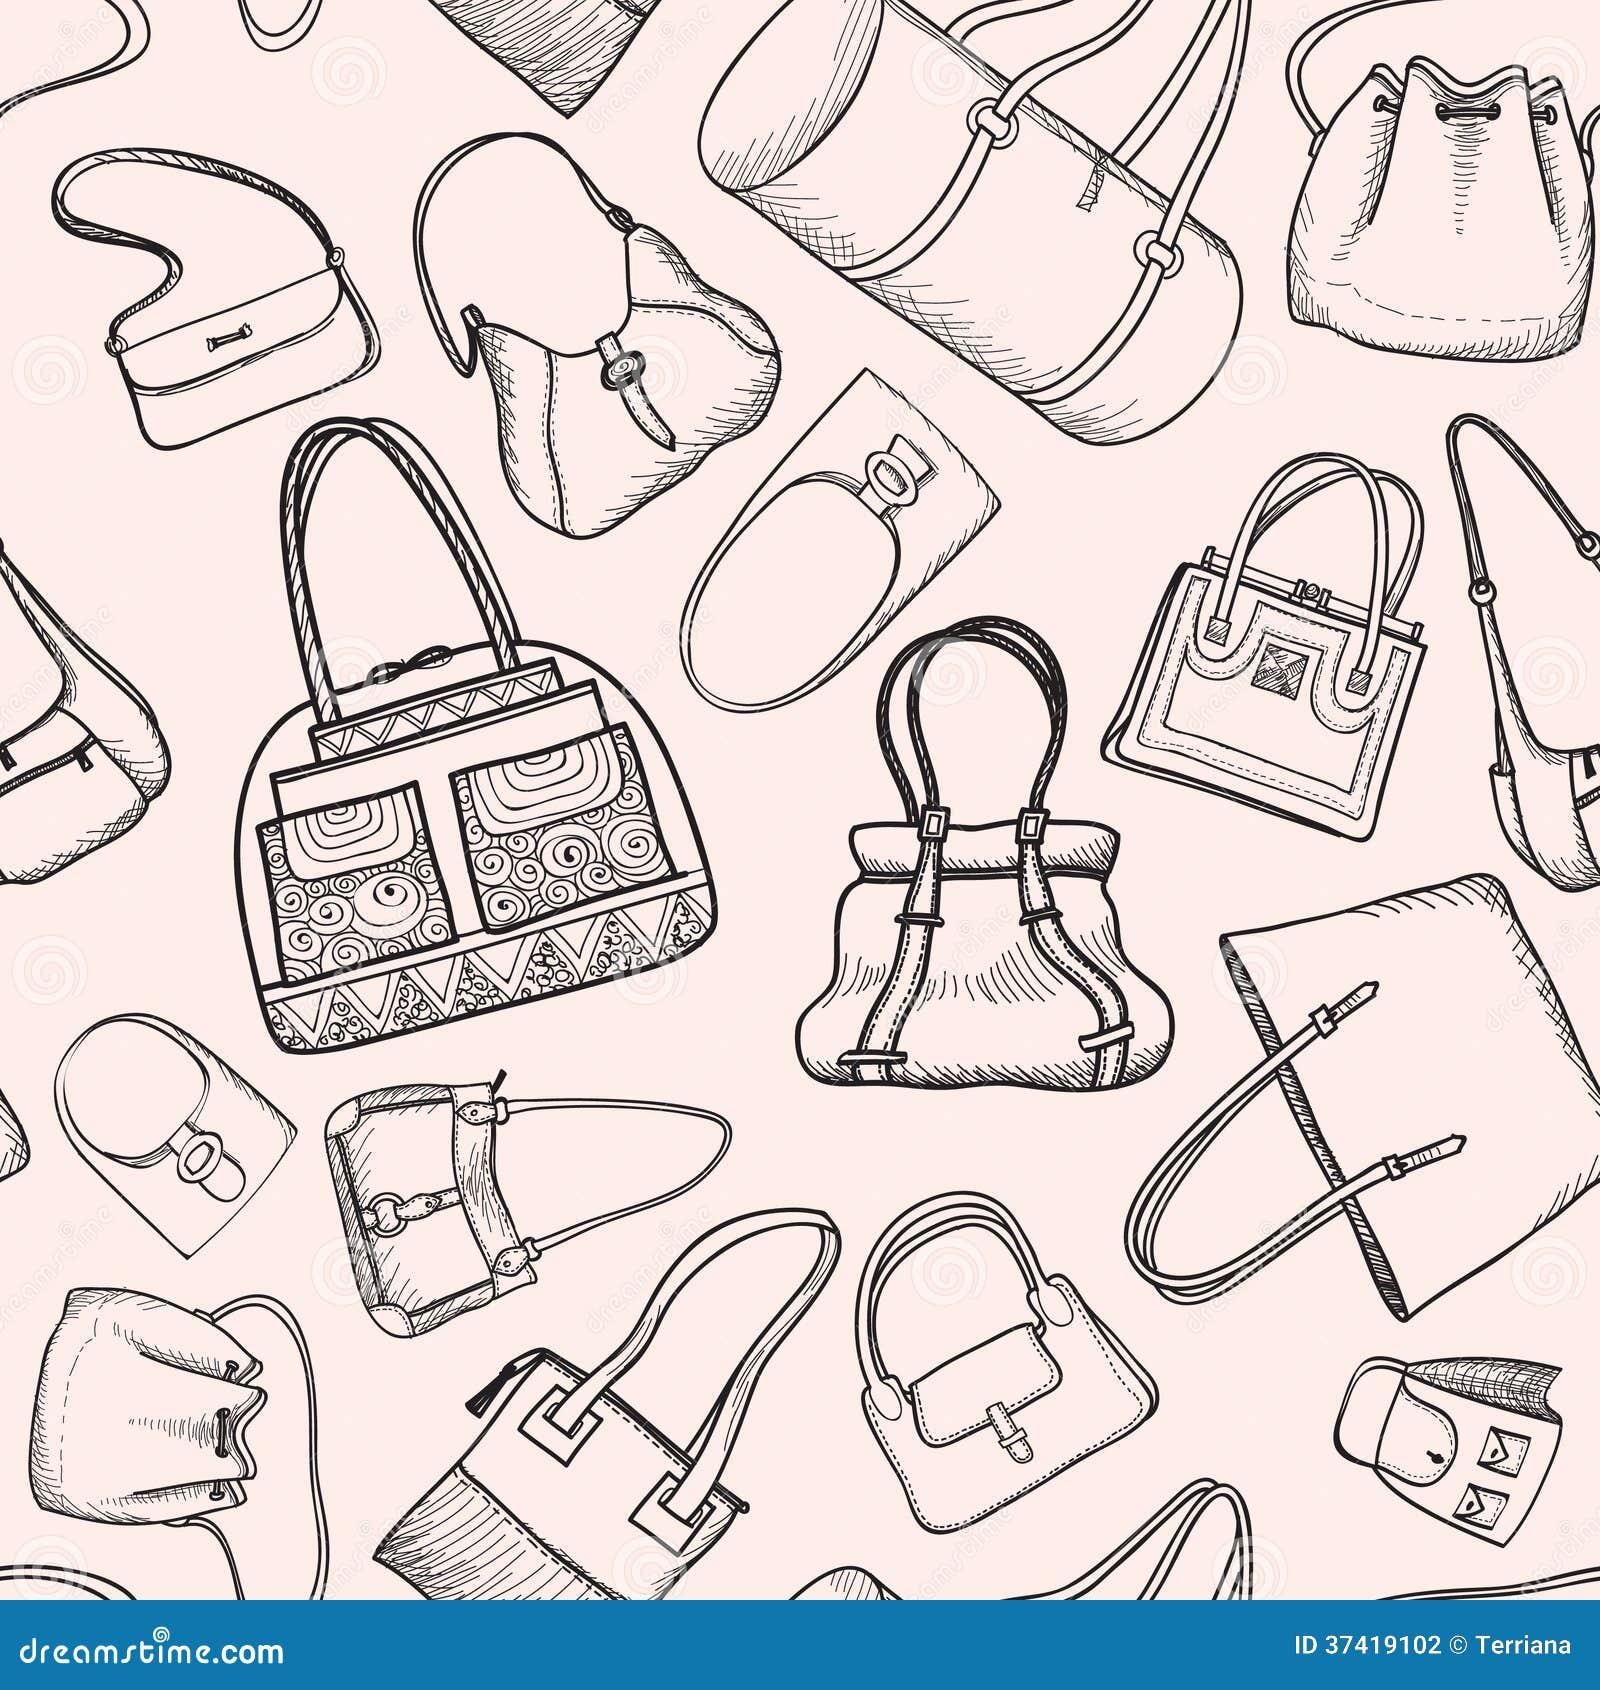 Hand Bags Fashion Seamless Sketch Pattern. Illustration 37419102 - Megapixl 509c50f7a5747